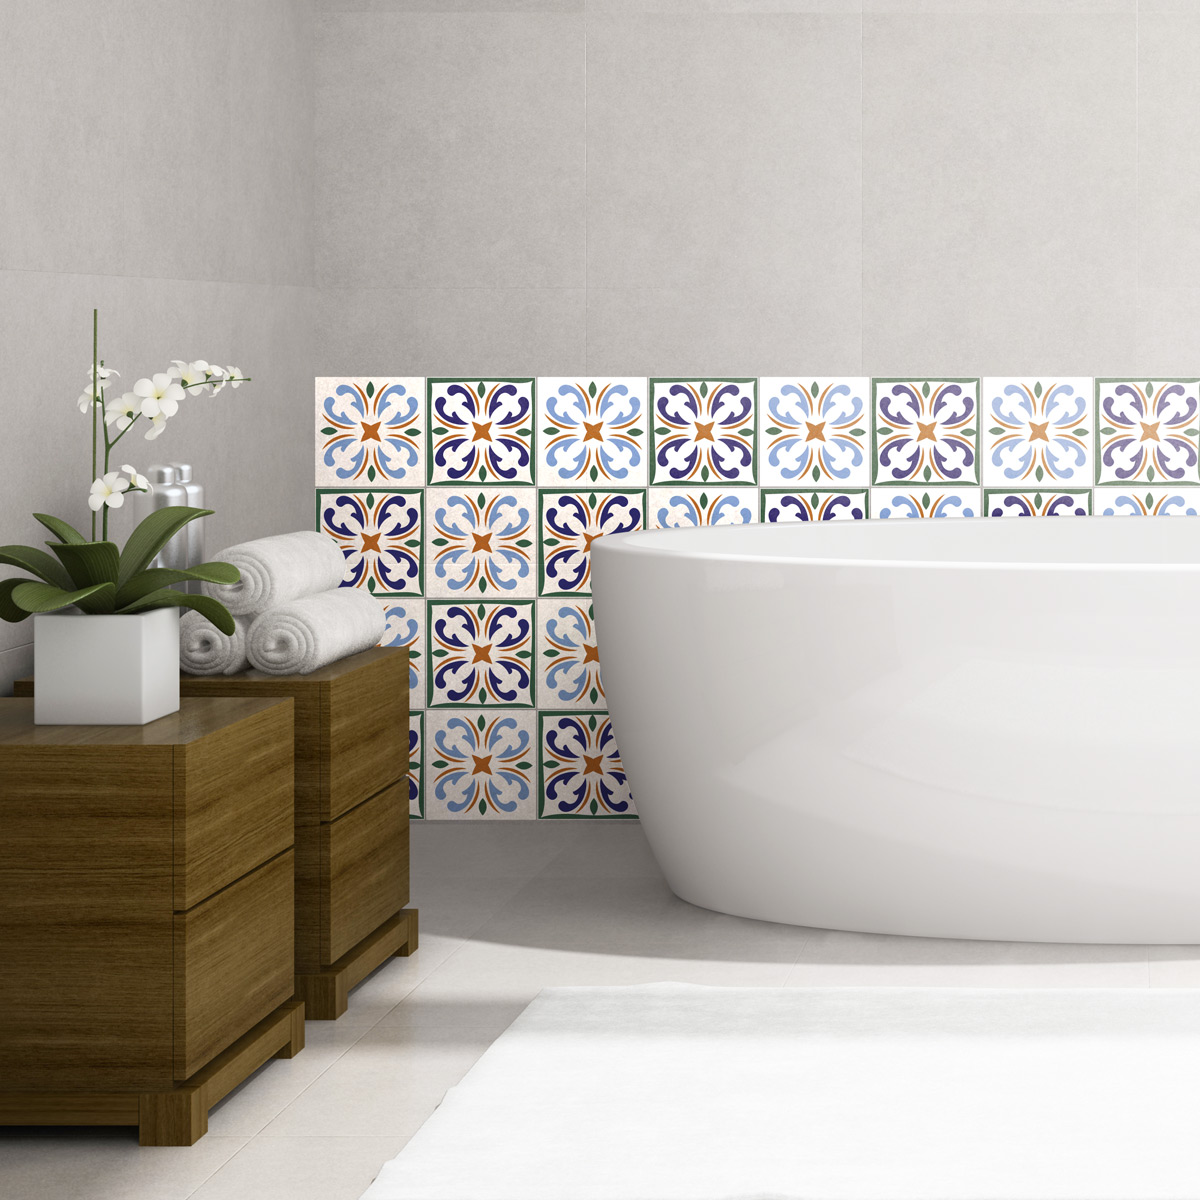 24 stickers carrelages azulejos faro cuisine carrelages. Black Bedroom Furniture Sets. Home Design Ideas